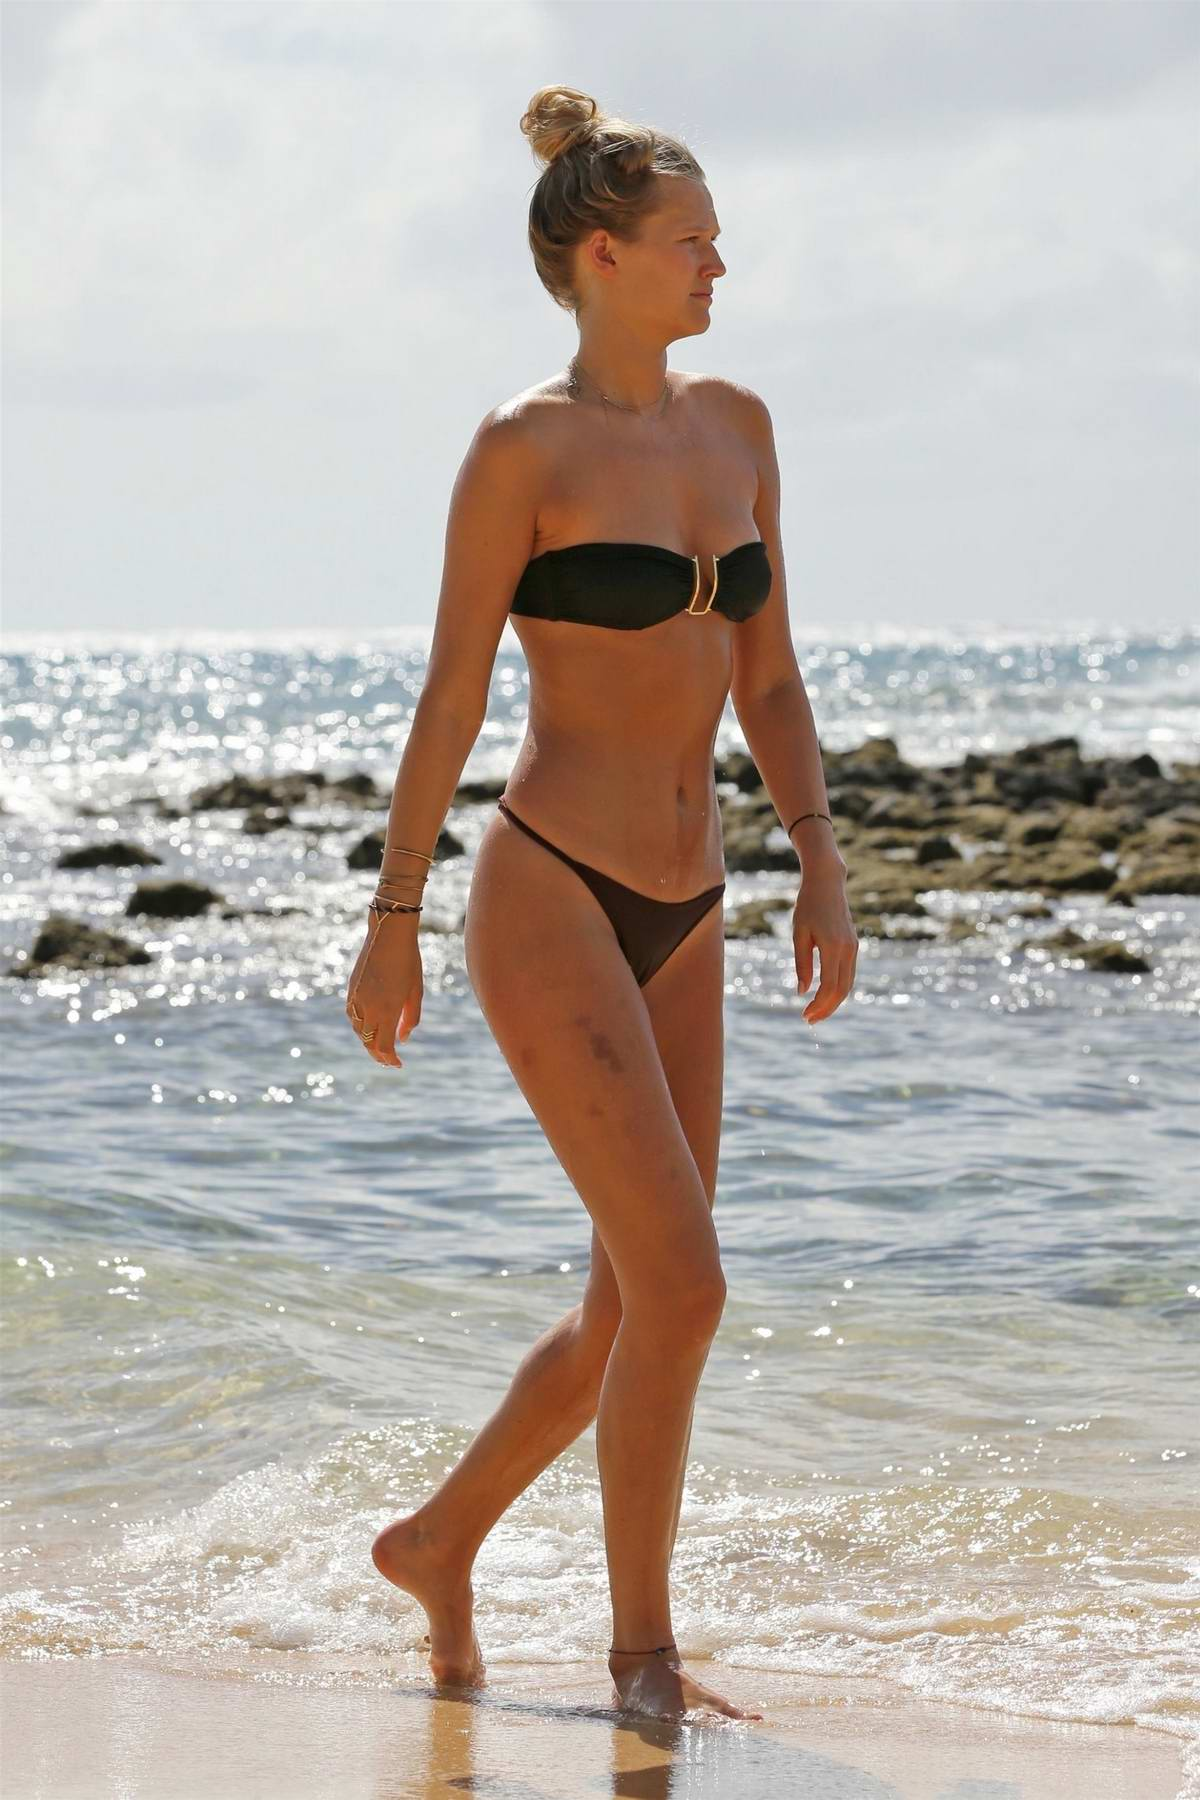 Toni Garrn wears a bikini as she spends a day relaxing at the beach in Hawaii